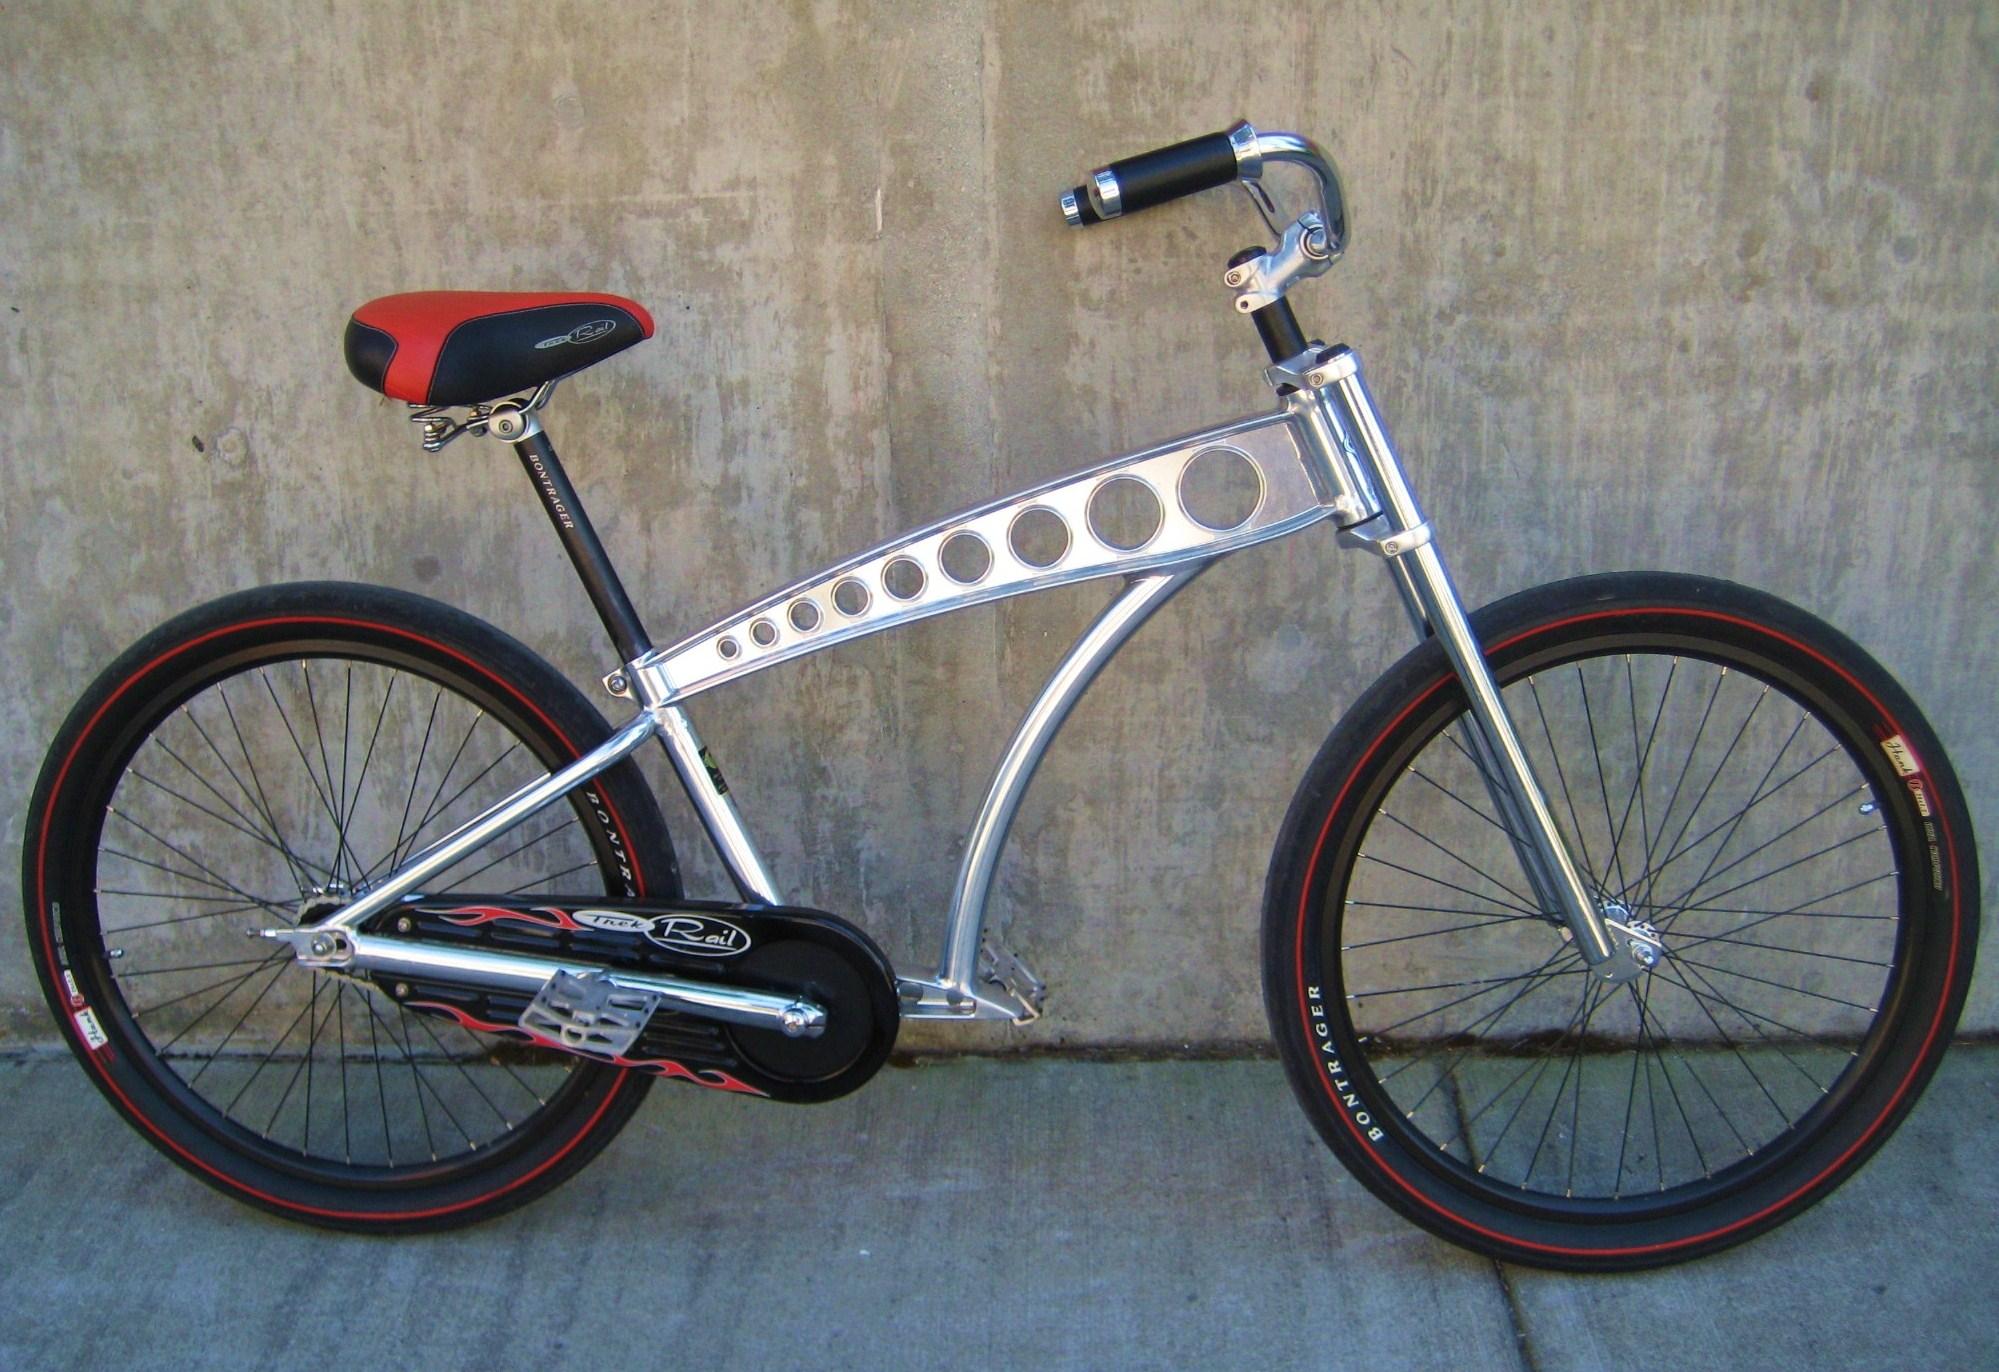 http://classiccycleus.com/home/wp-content/uploads/2012/08/Trek-Rail.jpg